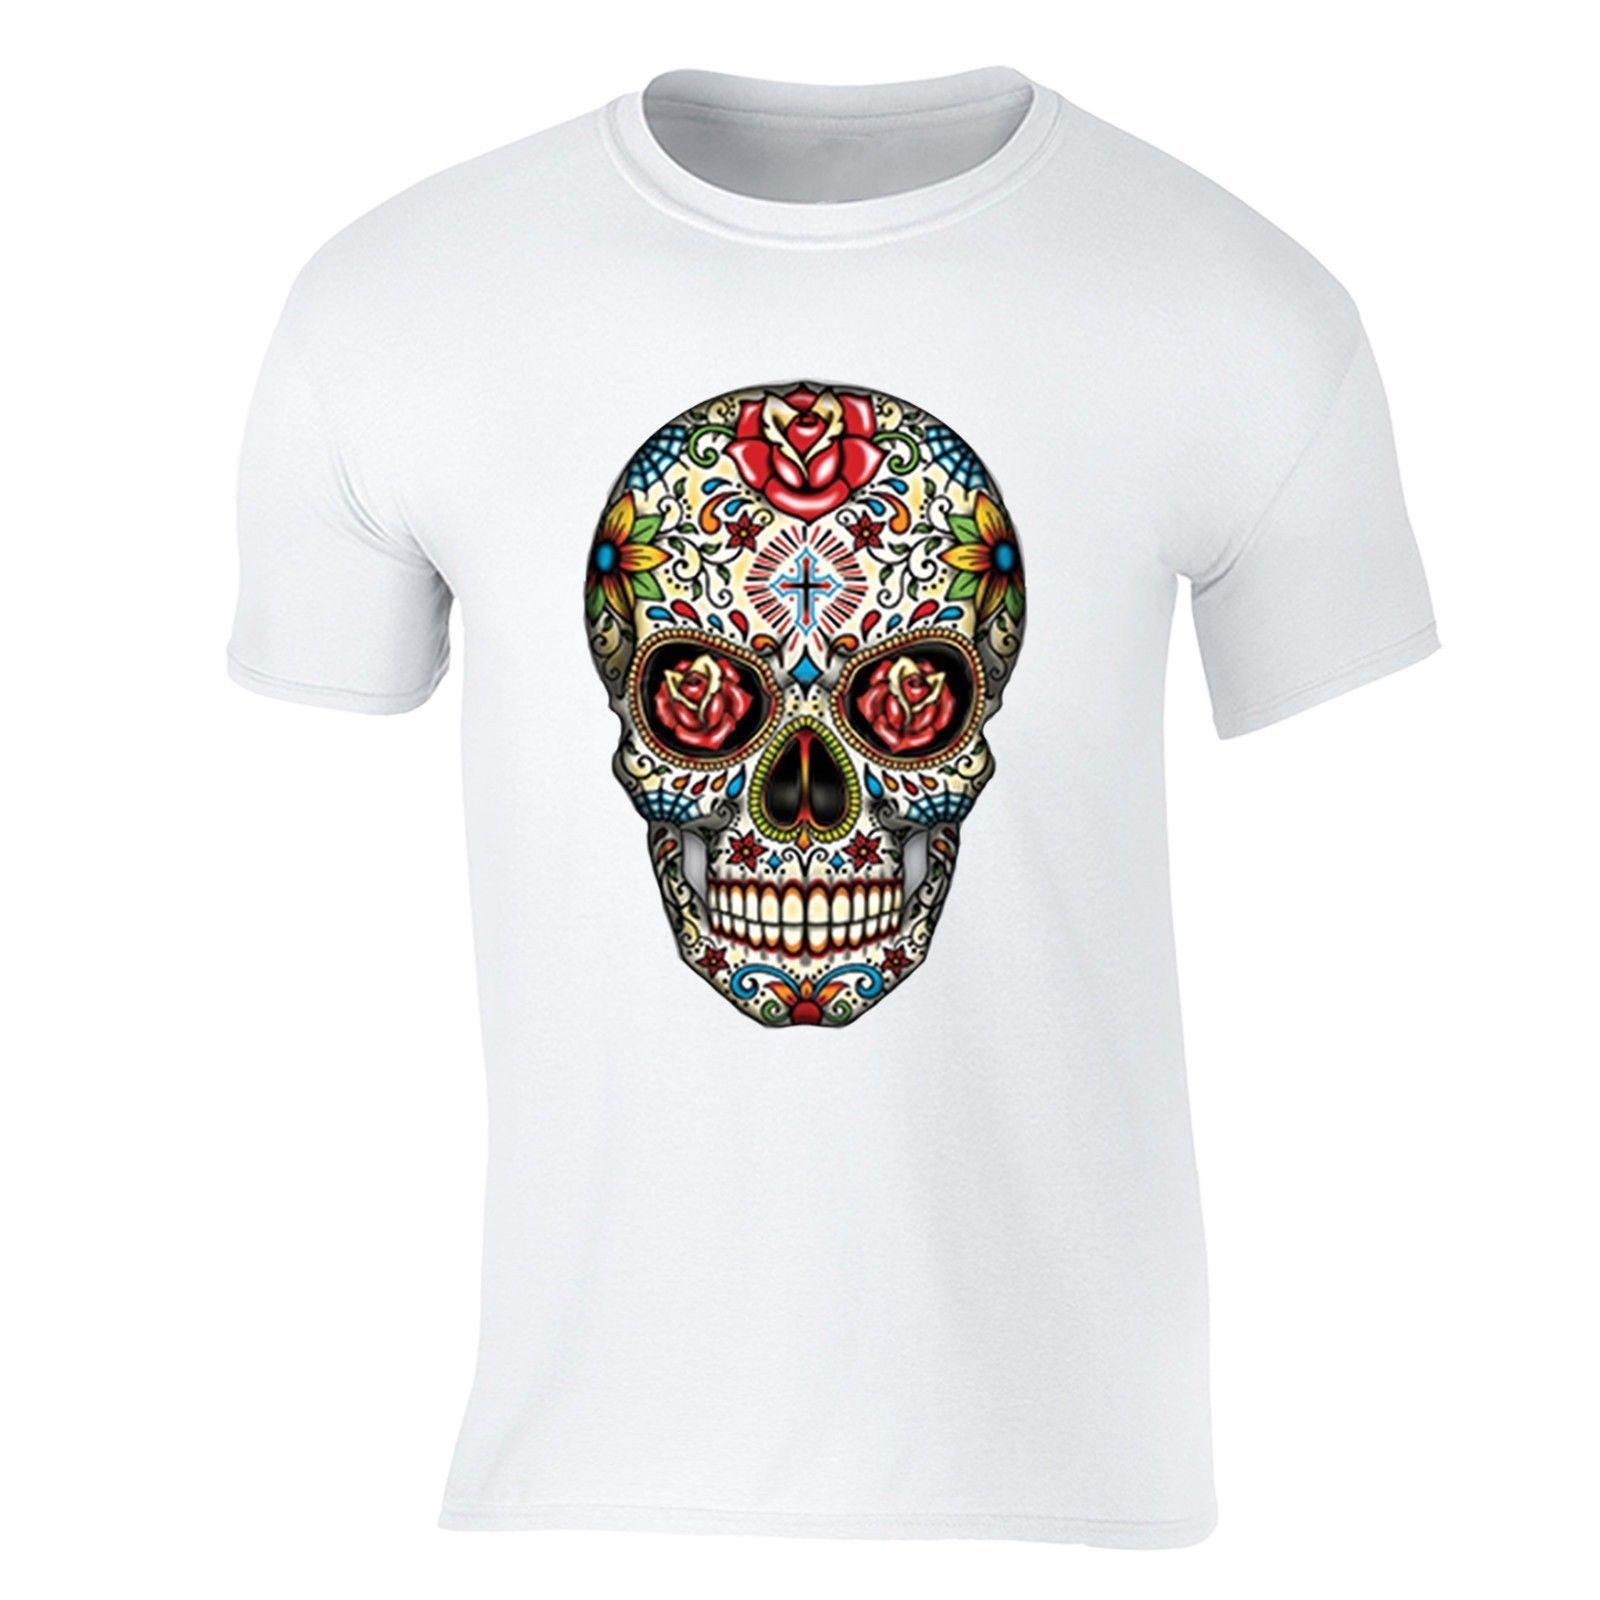 c799595c4 Fashion Men Tshirt Sugar Skull Day Of The Dead T Shirt Flowers Mexican  Gothic Dia Los Muertos Shirt O Neck T Shirt Shirts With Designs R Shirt From  ...